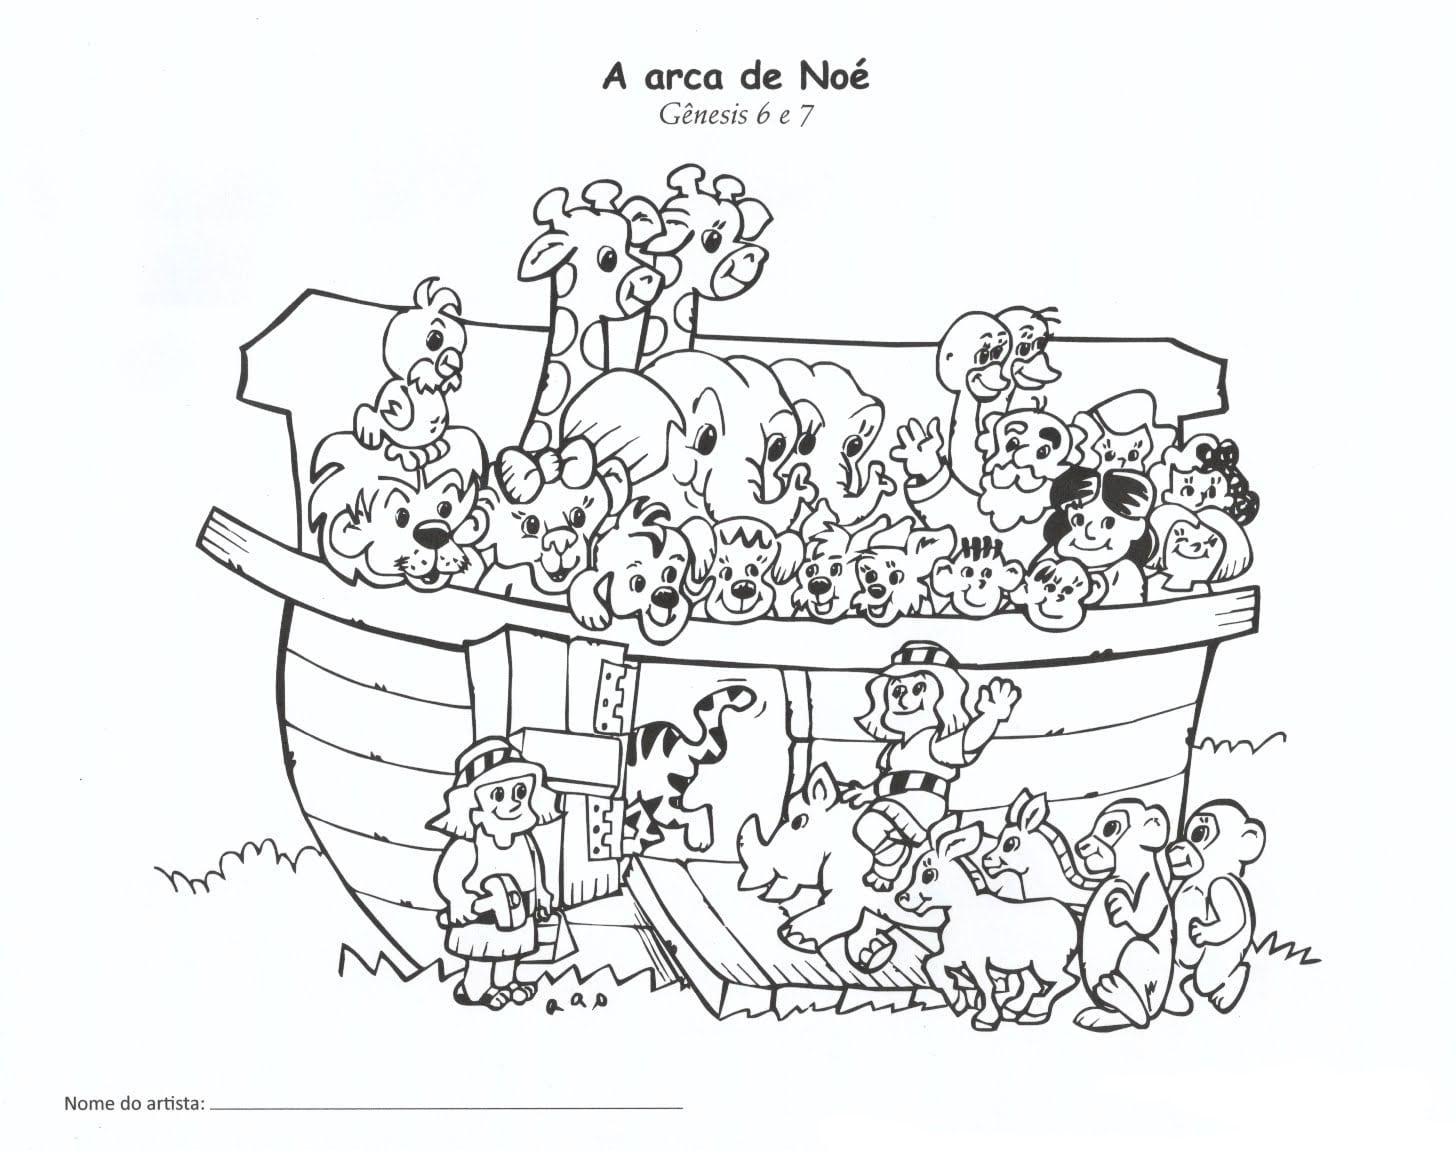 30 Desenhos, Moldes E Riscos Da Arca De Noé Para Colorir, Pintar